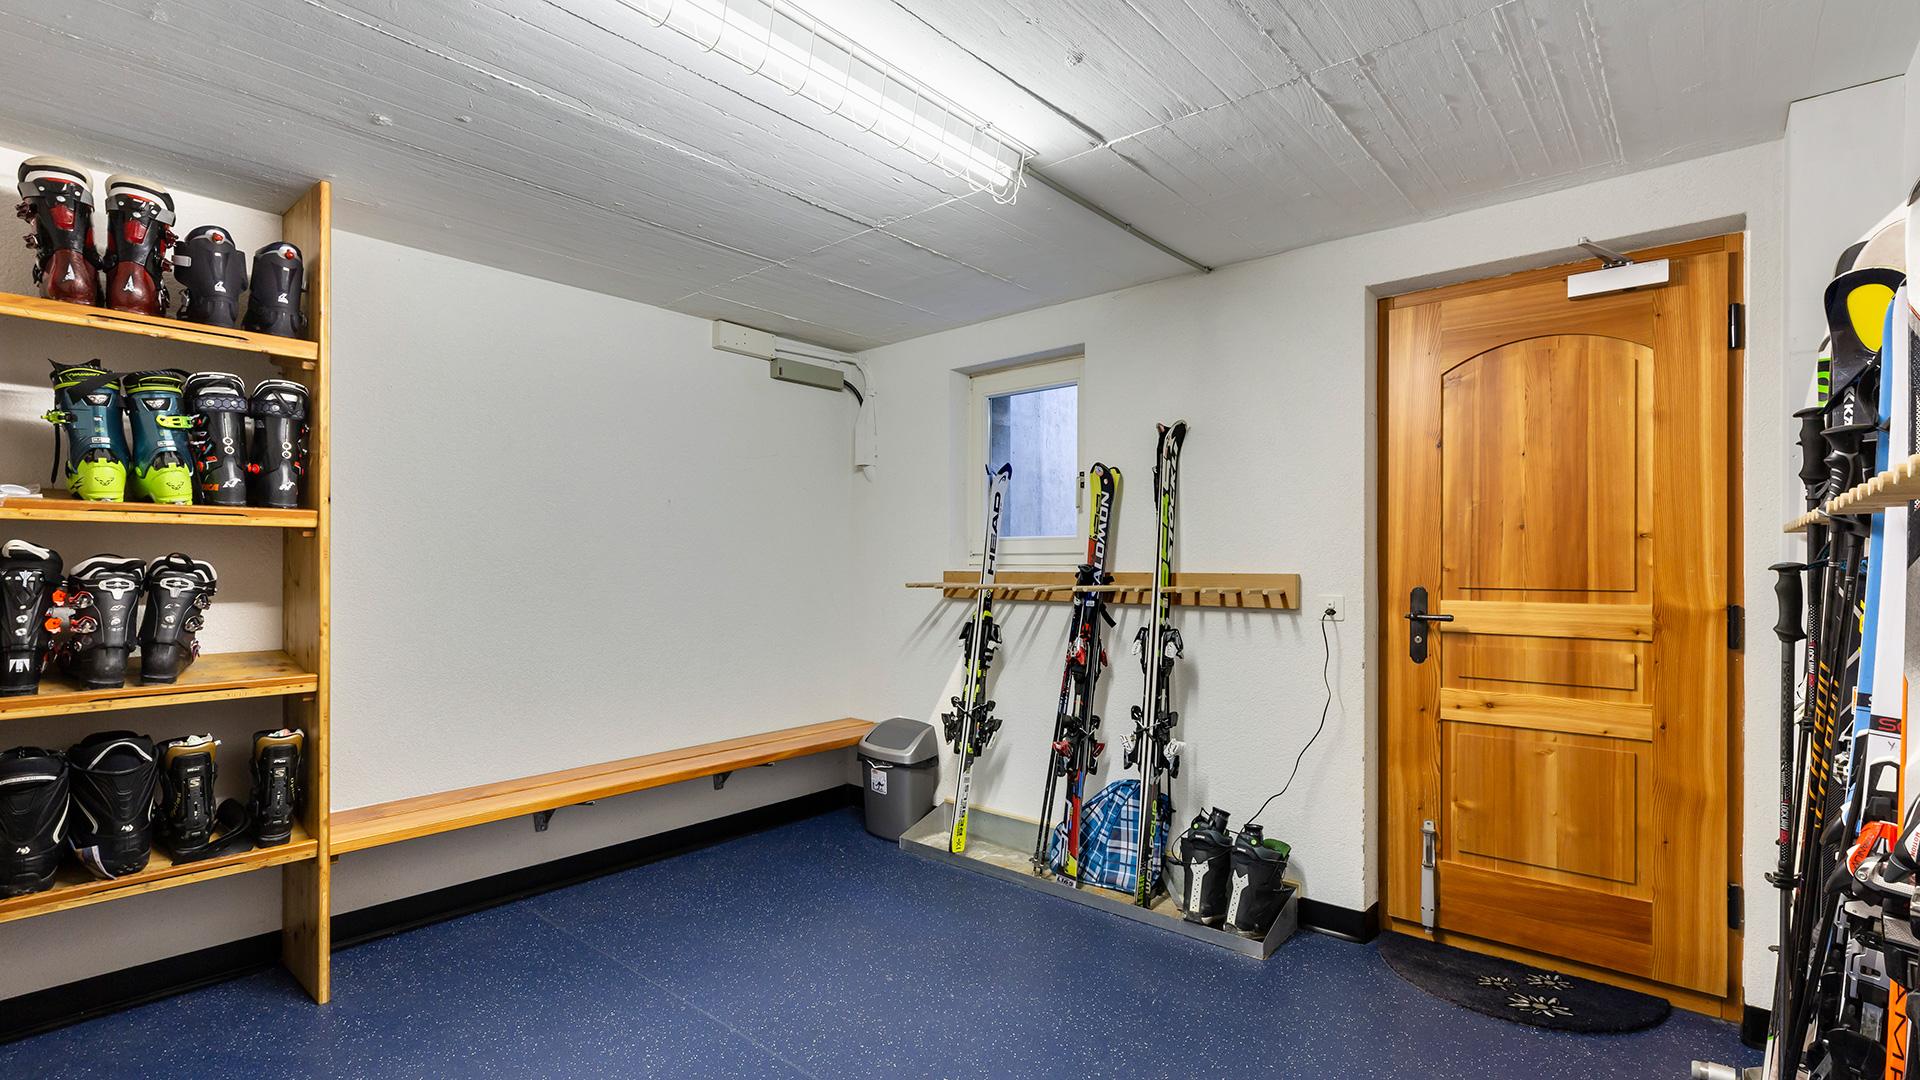 Vira Apt Apartments, Switzerland